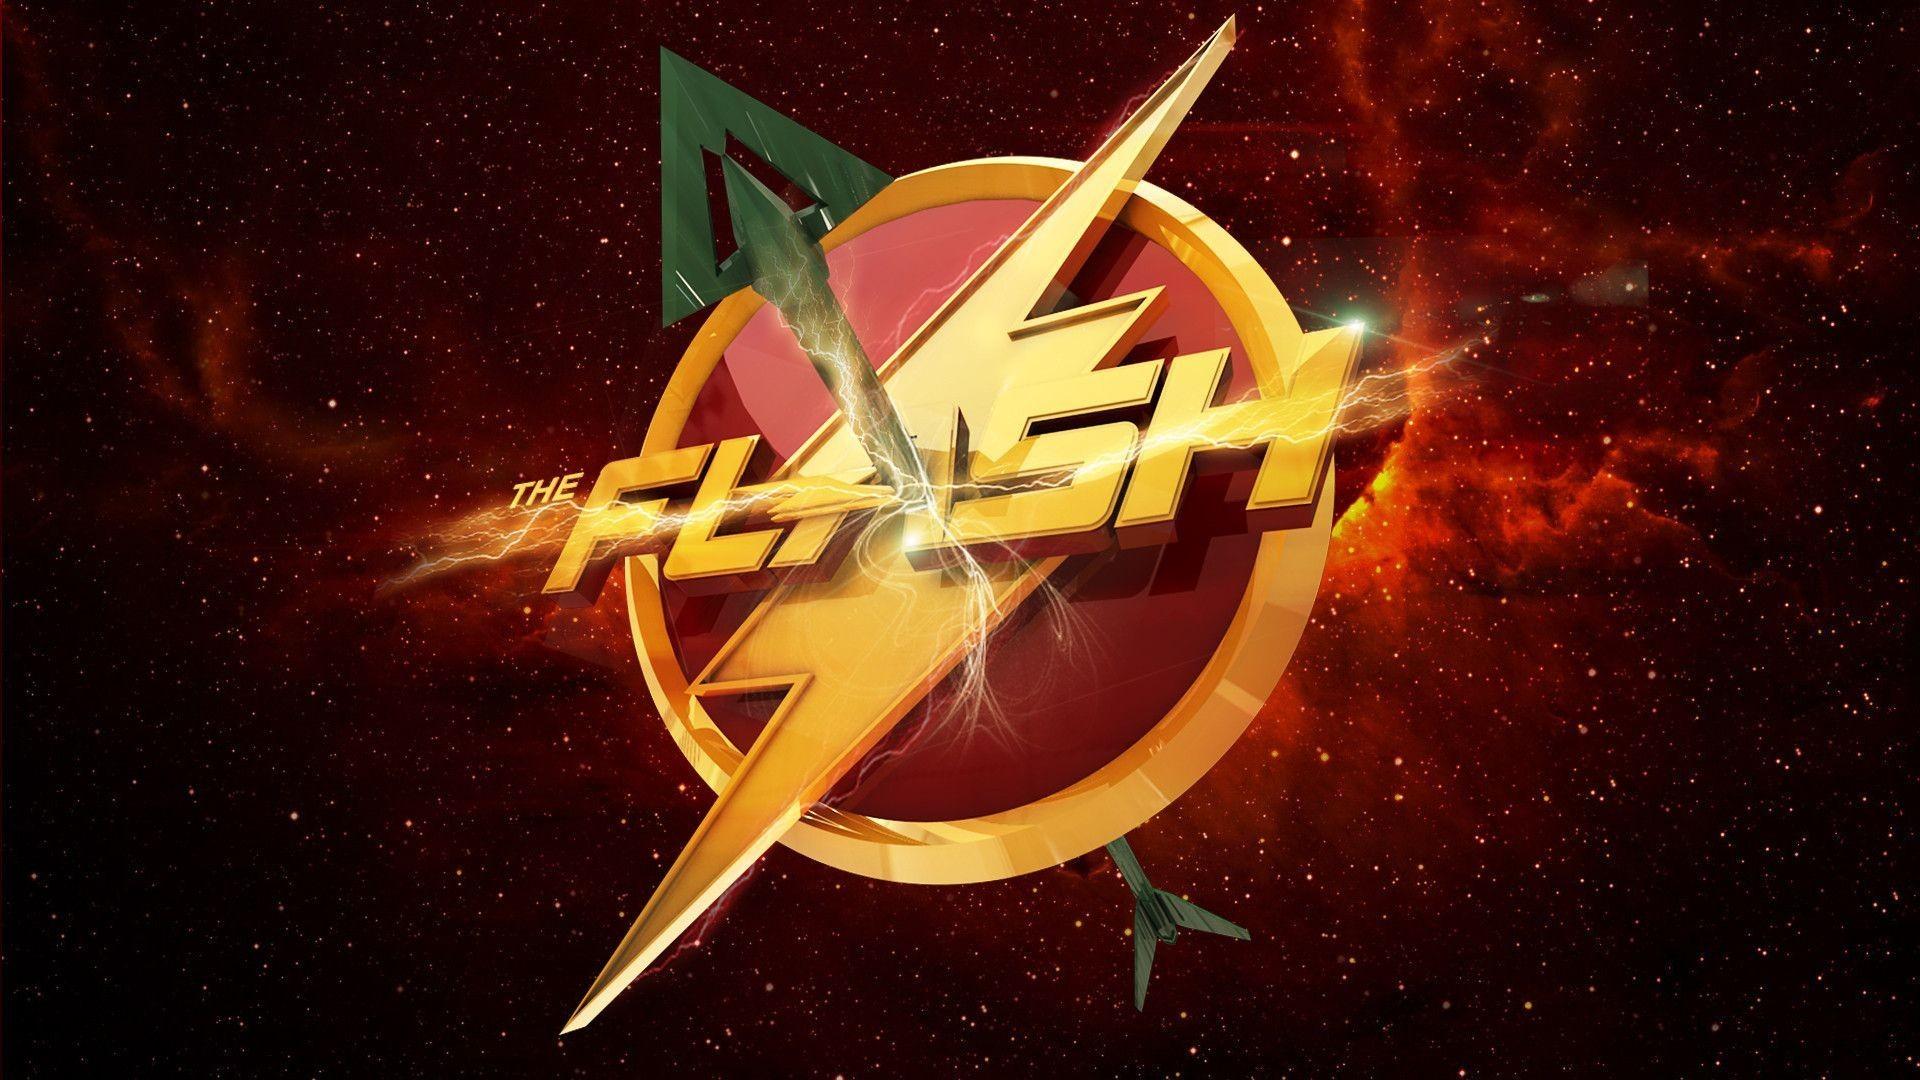 Flash vs Arrow HD Desktop Wallpapers